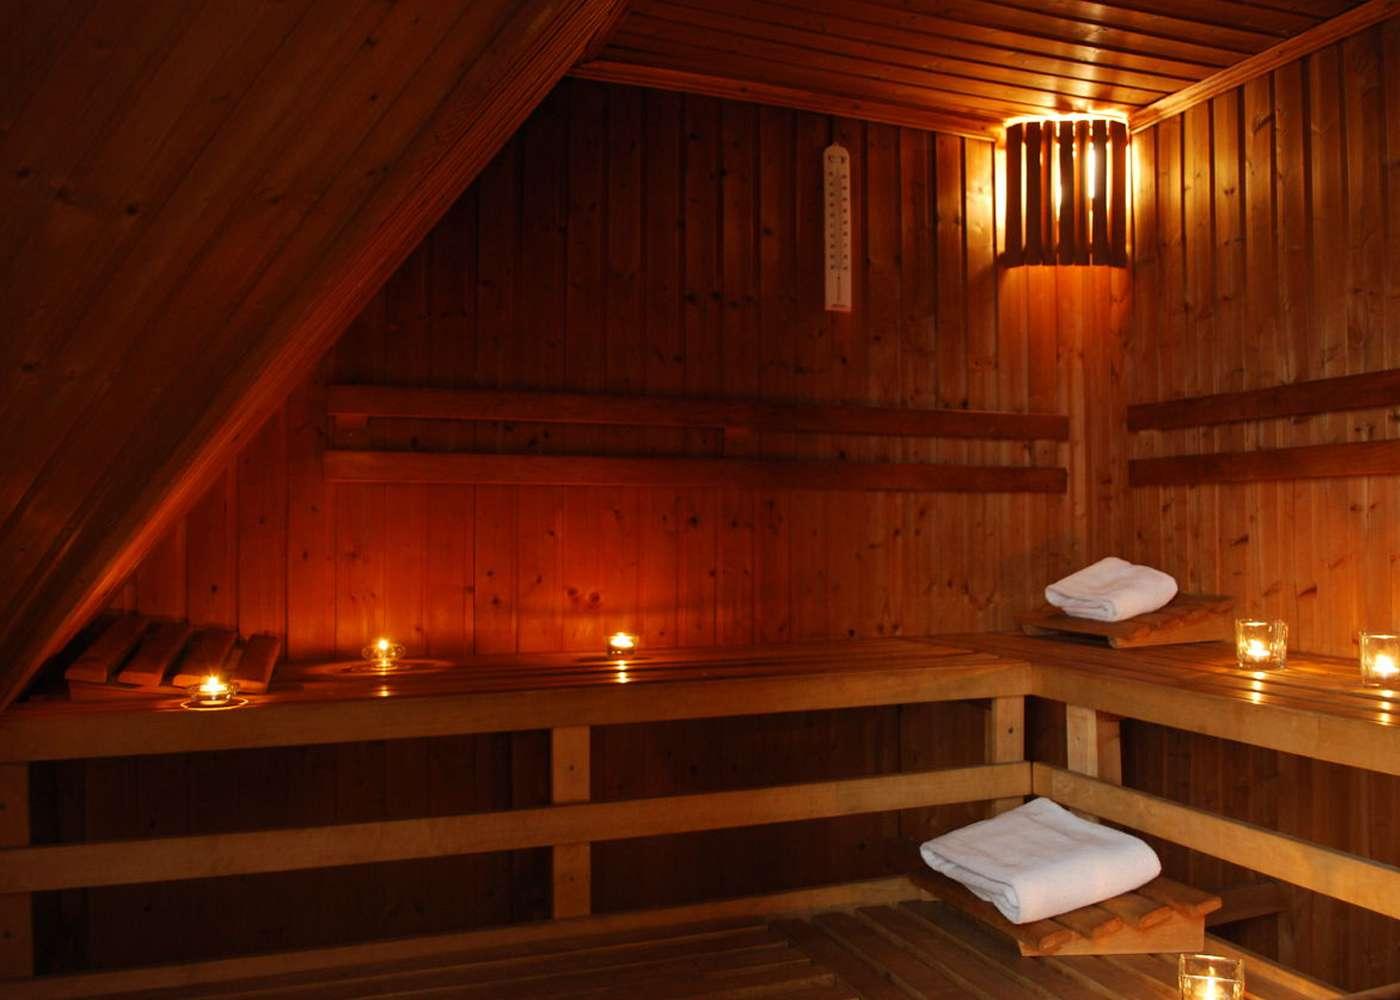 galeria Sauna zdjęcie 3